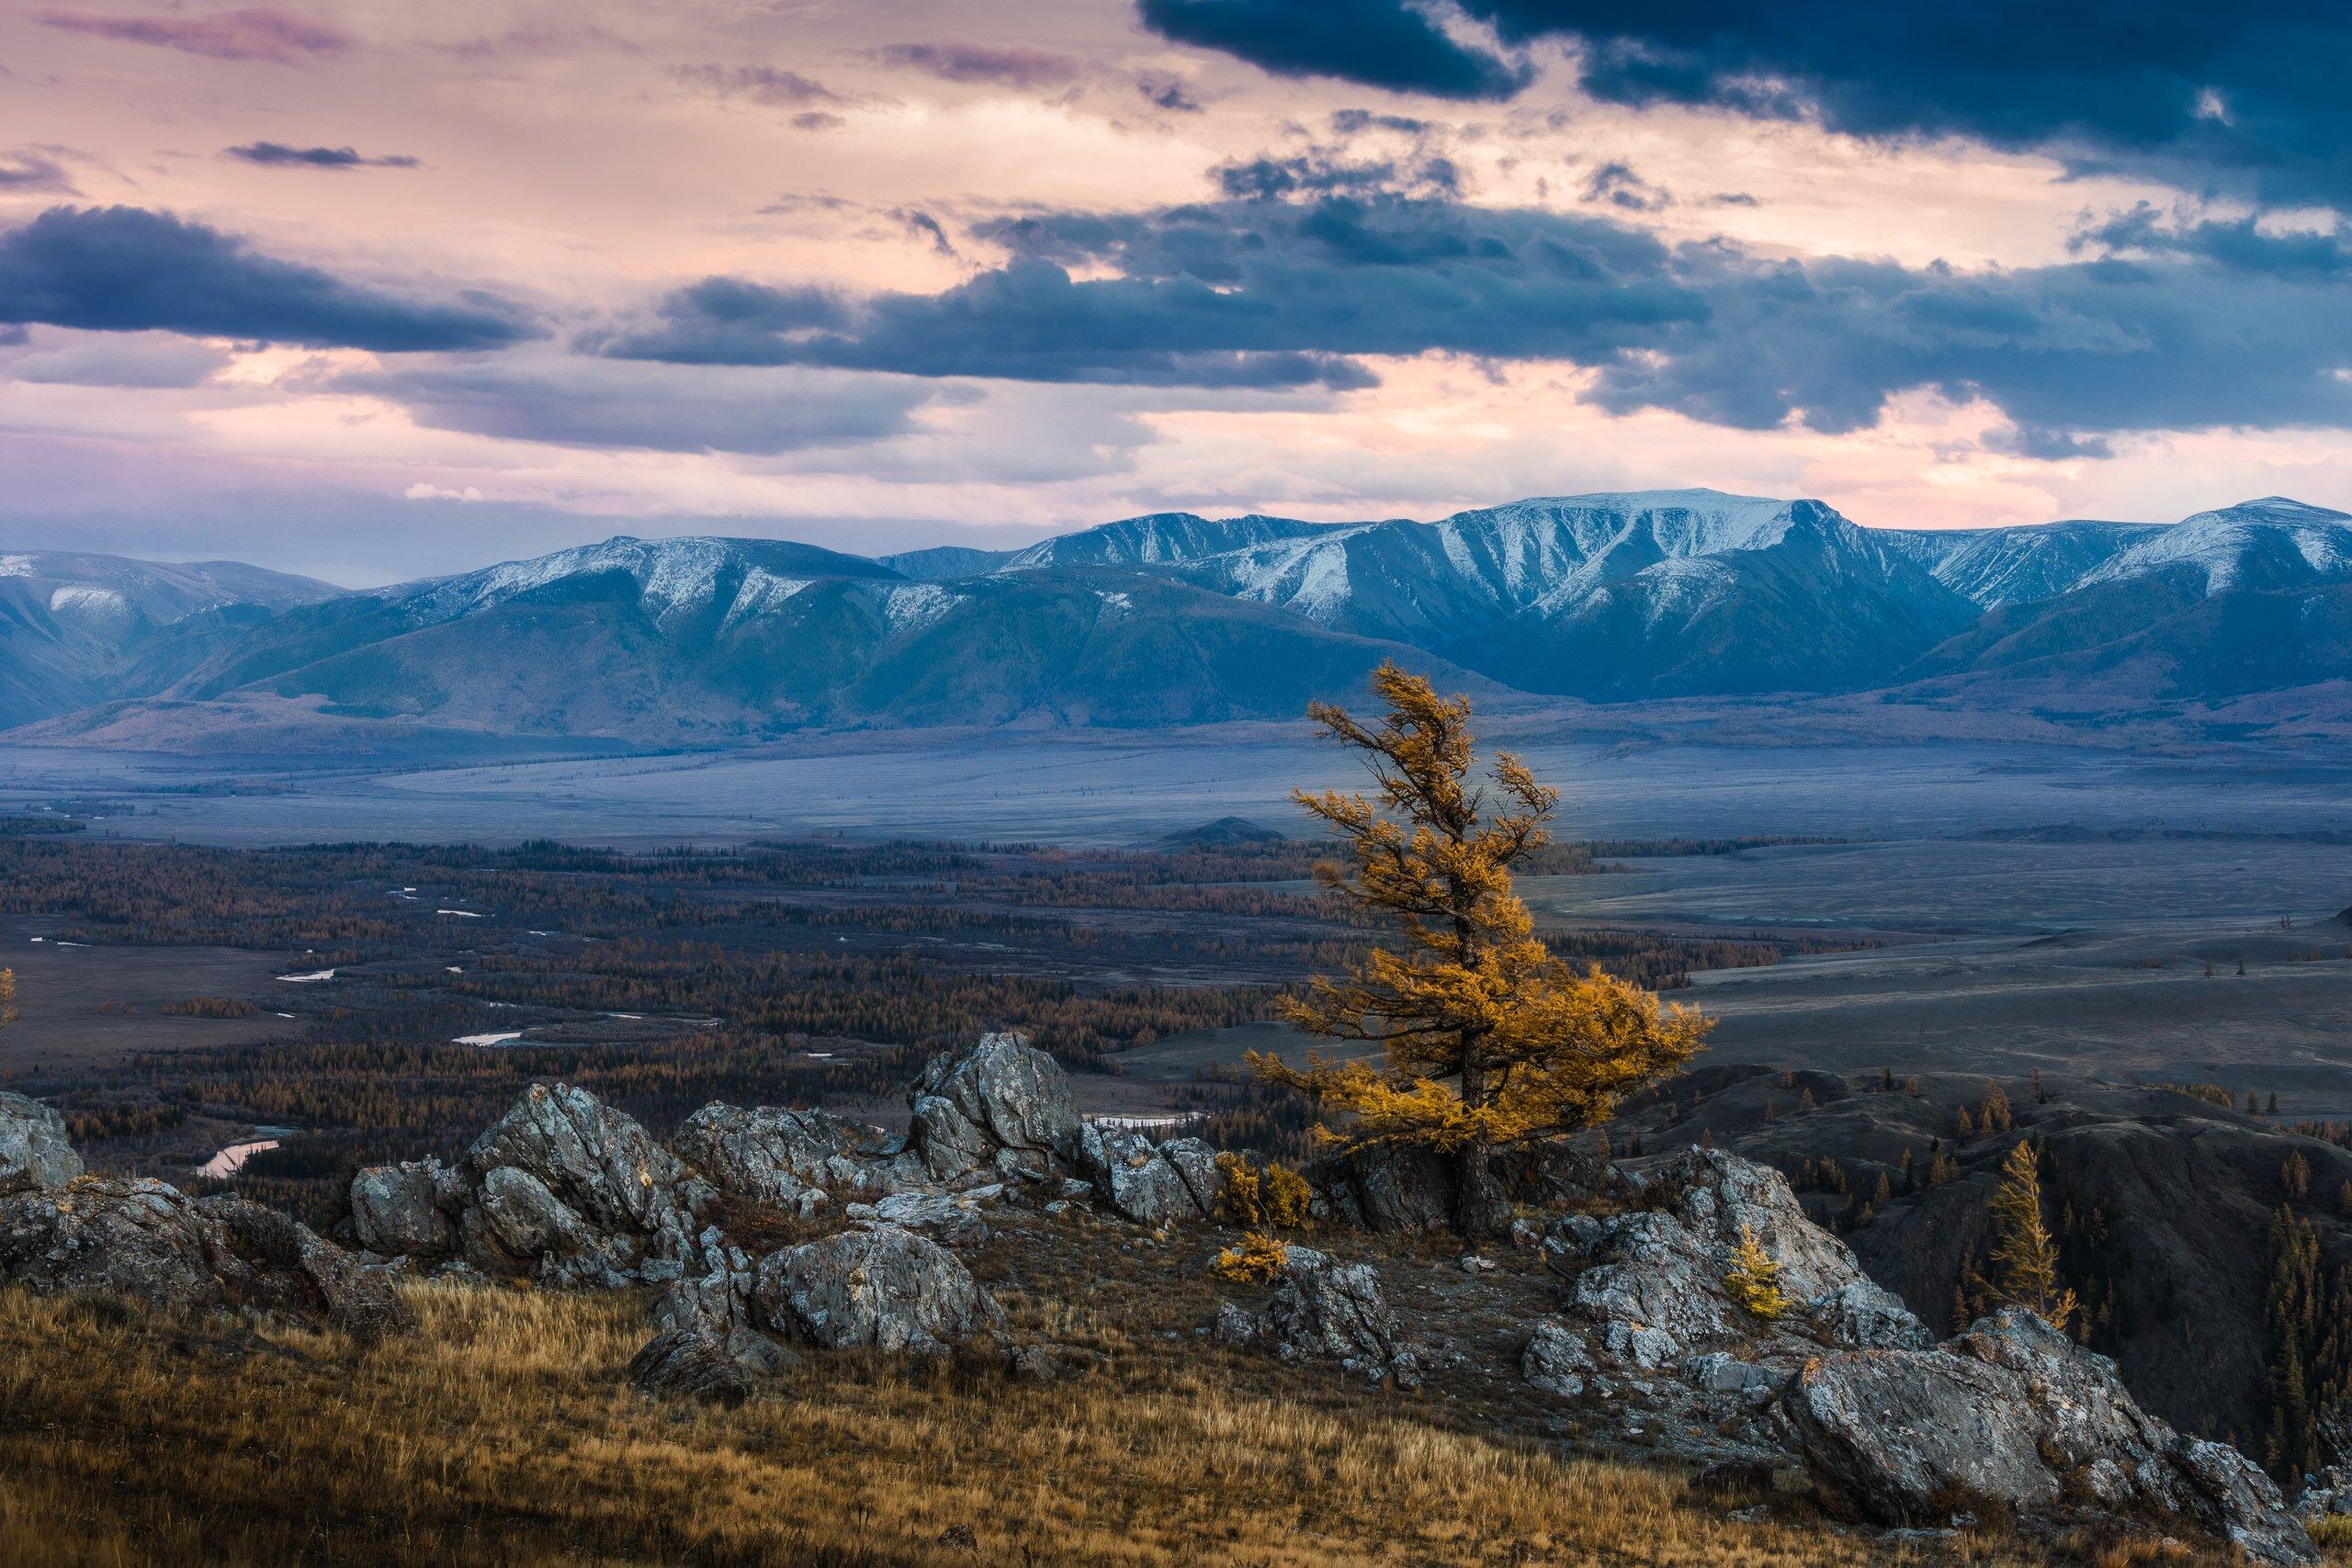 осень, алтай, чуя, степь, горы, Marina Malikova